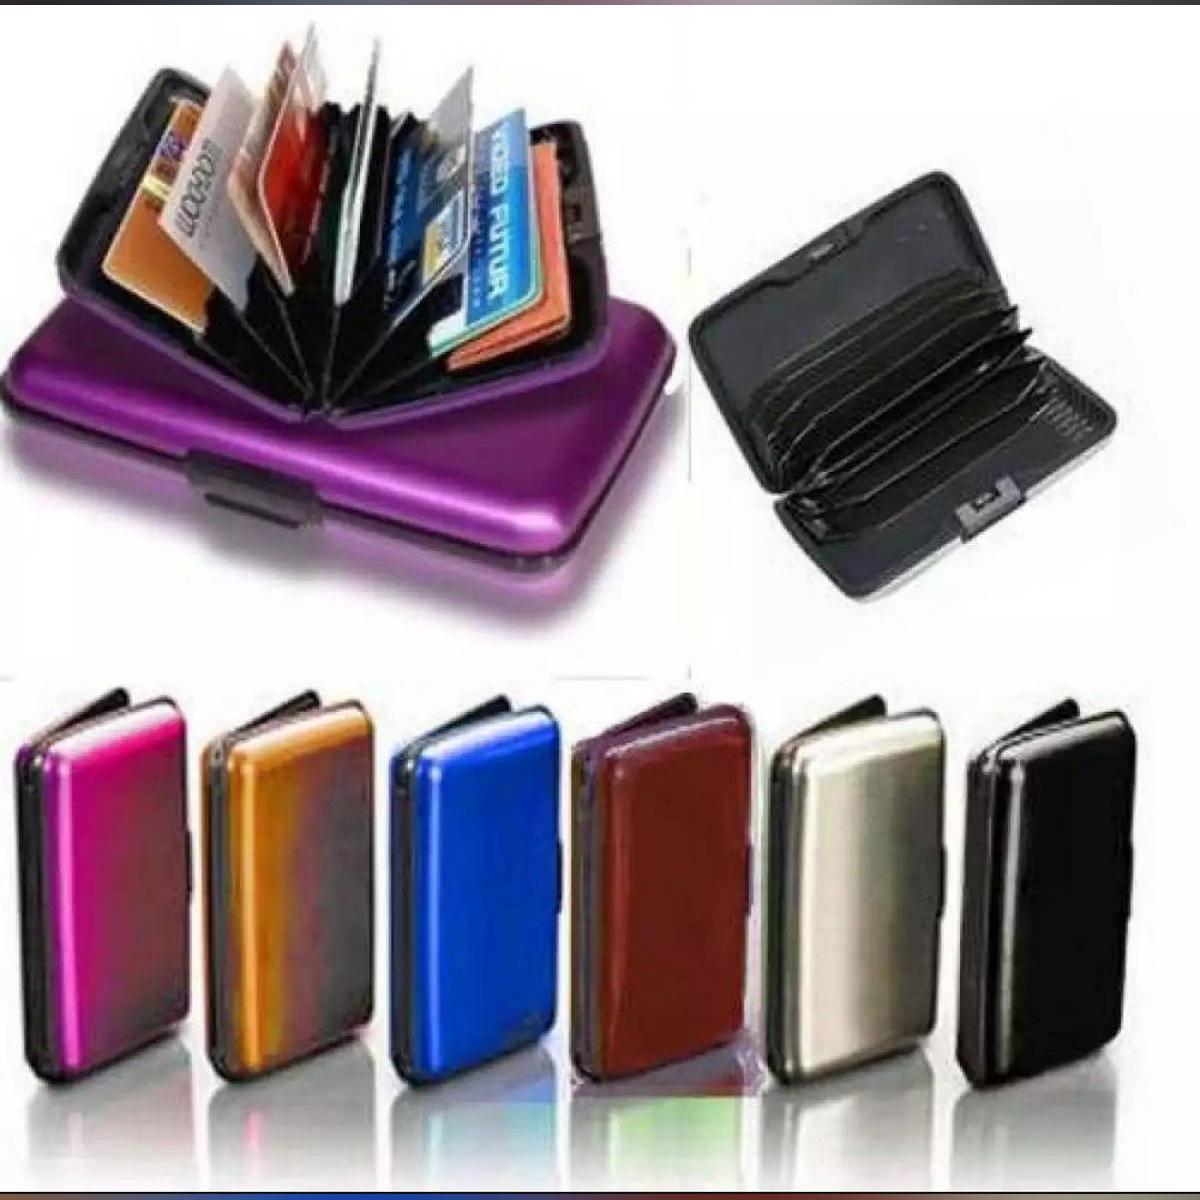 Aluminium Case Water Proof Aluma Wallet Multicolor for Men and Women